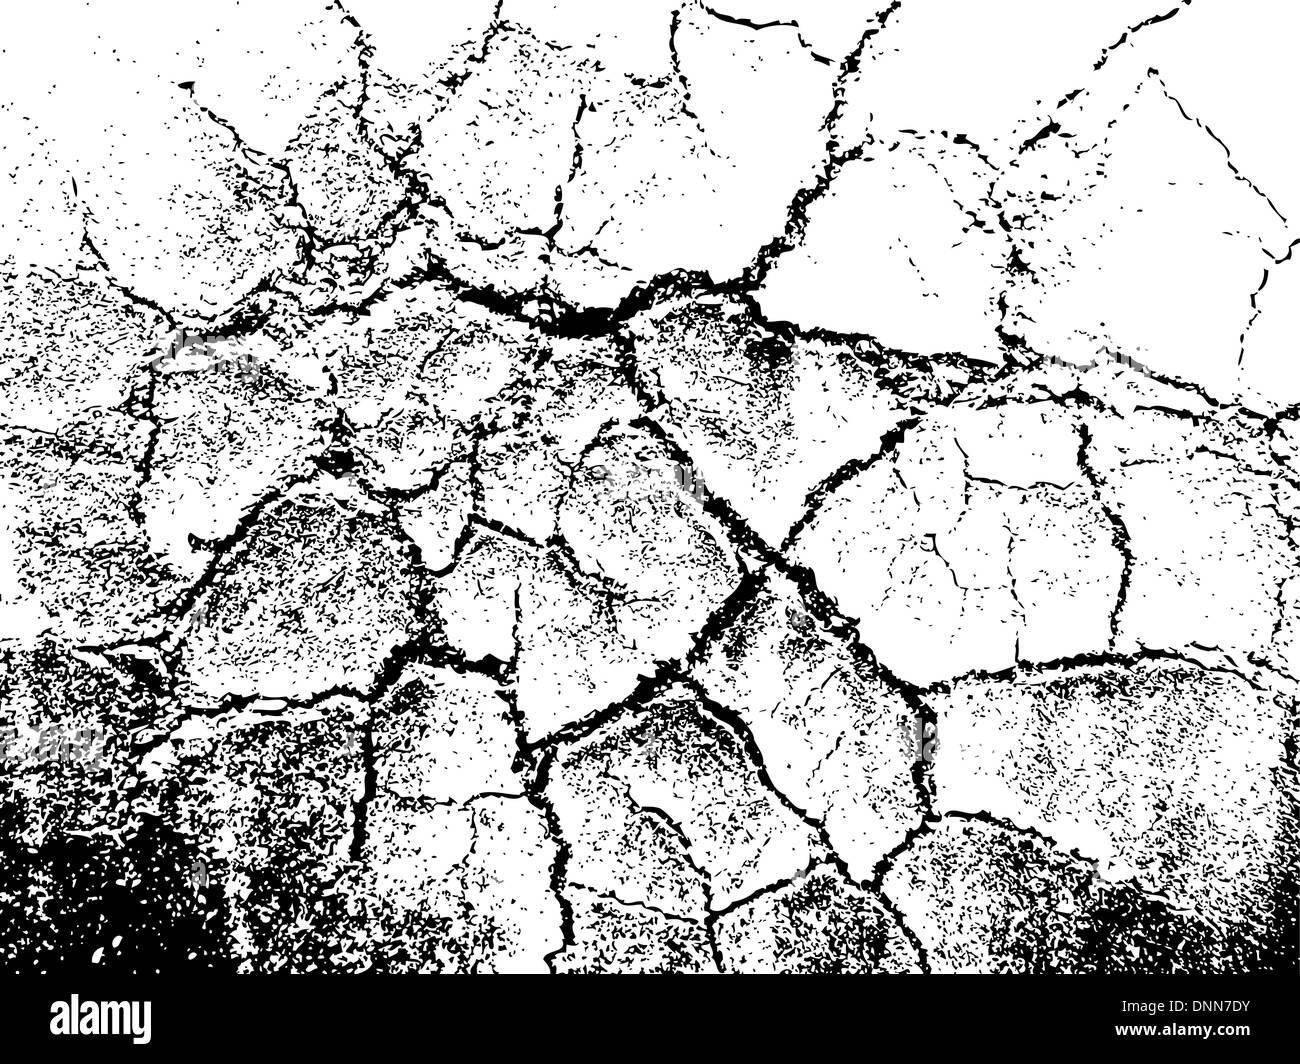 cracked grunge texture - Stock Image